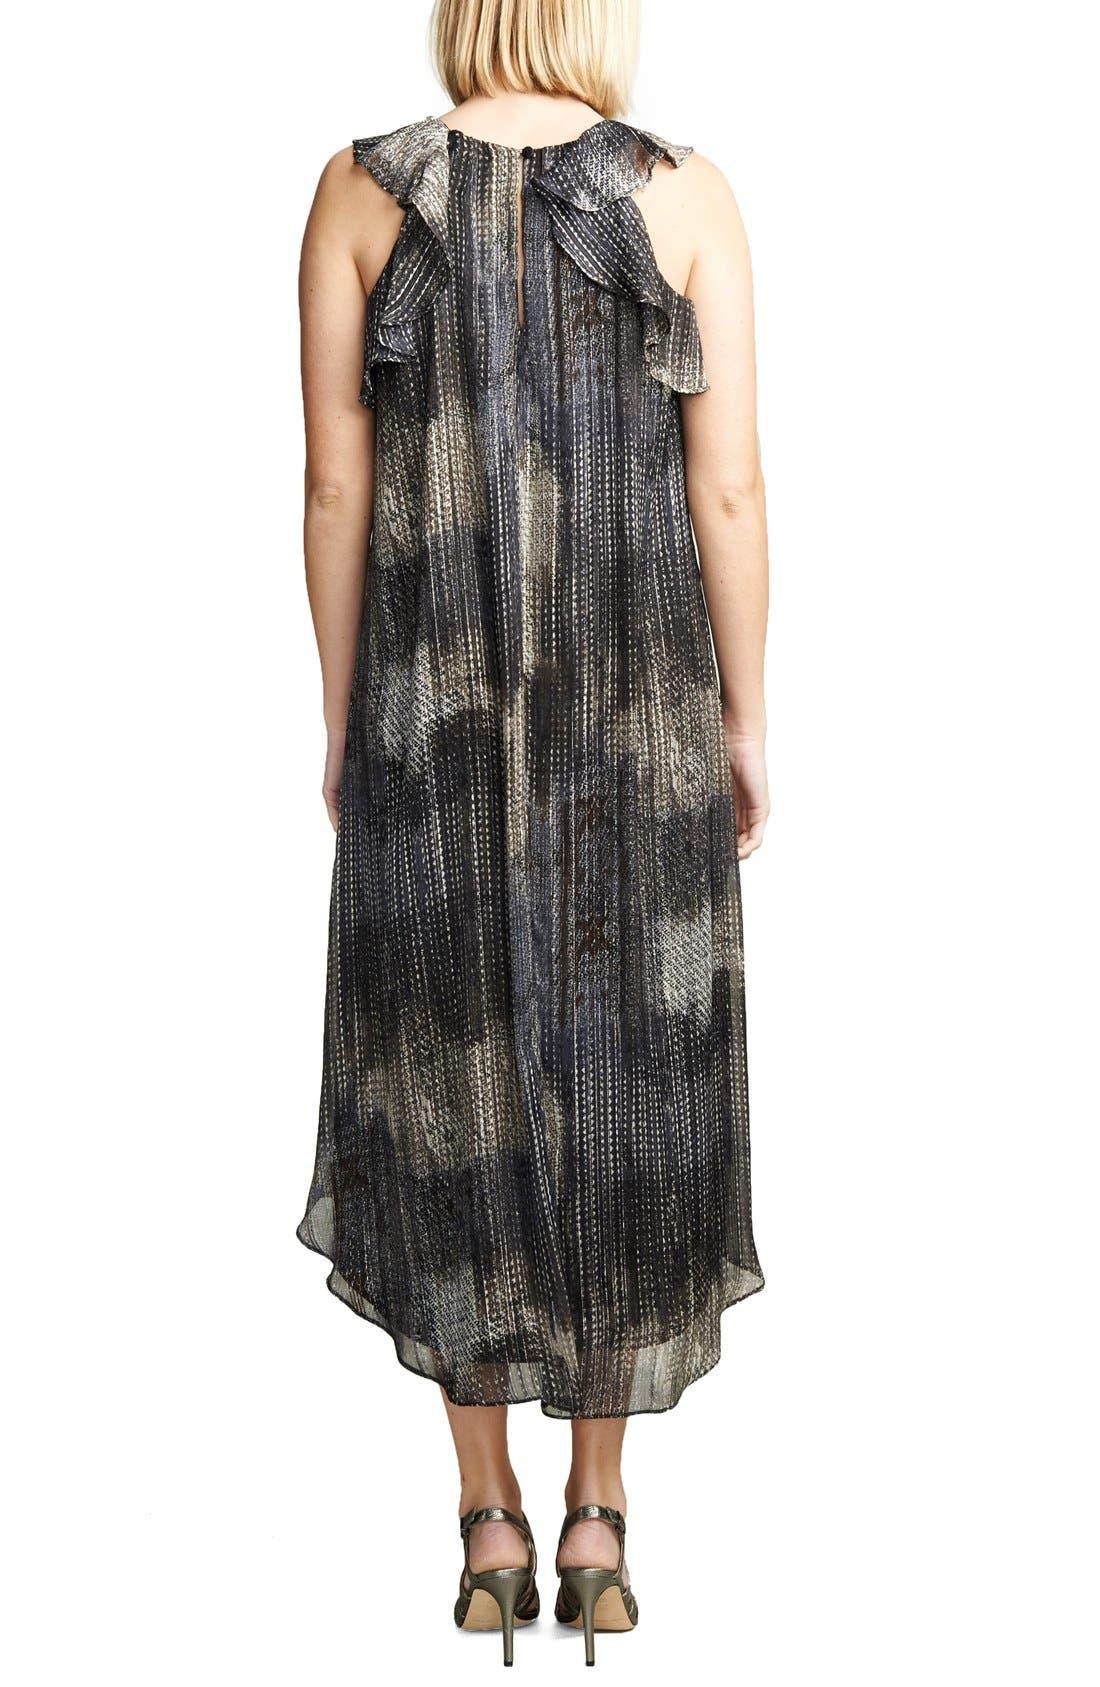 Ruffle Chiffon High/Low Maternity Dress,                             Alternate thumbnail 2, color,                             METALLIC LUREX PRINT